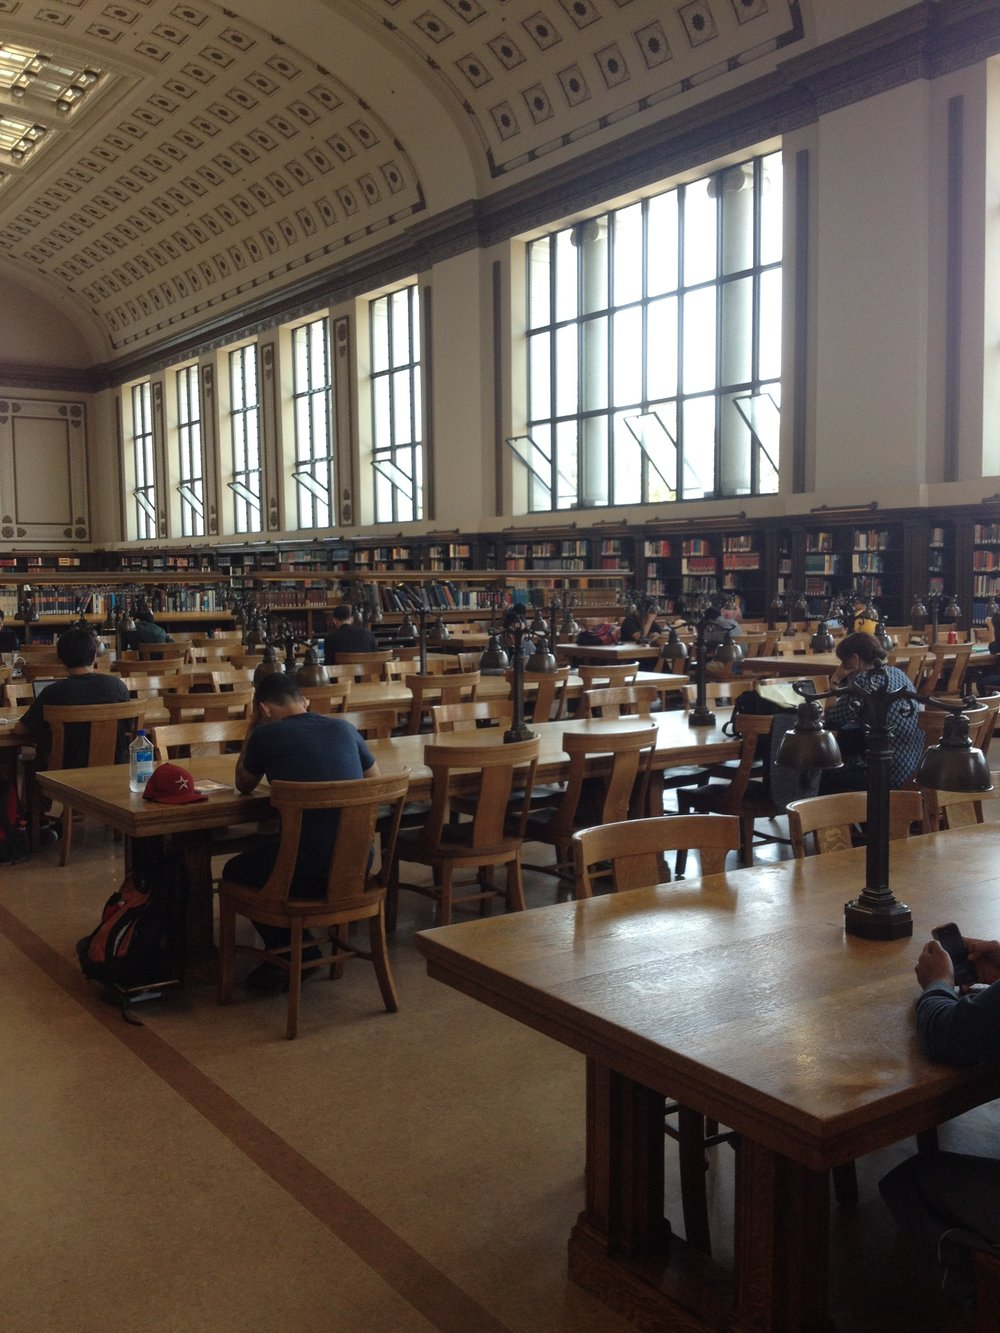 UC Berkley Library